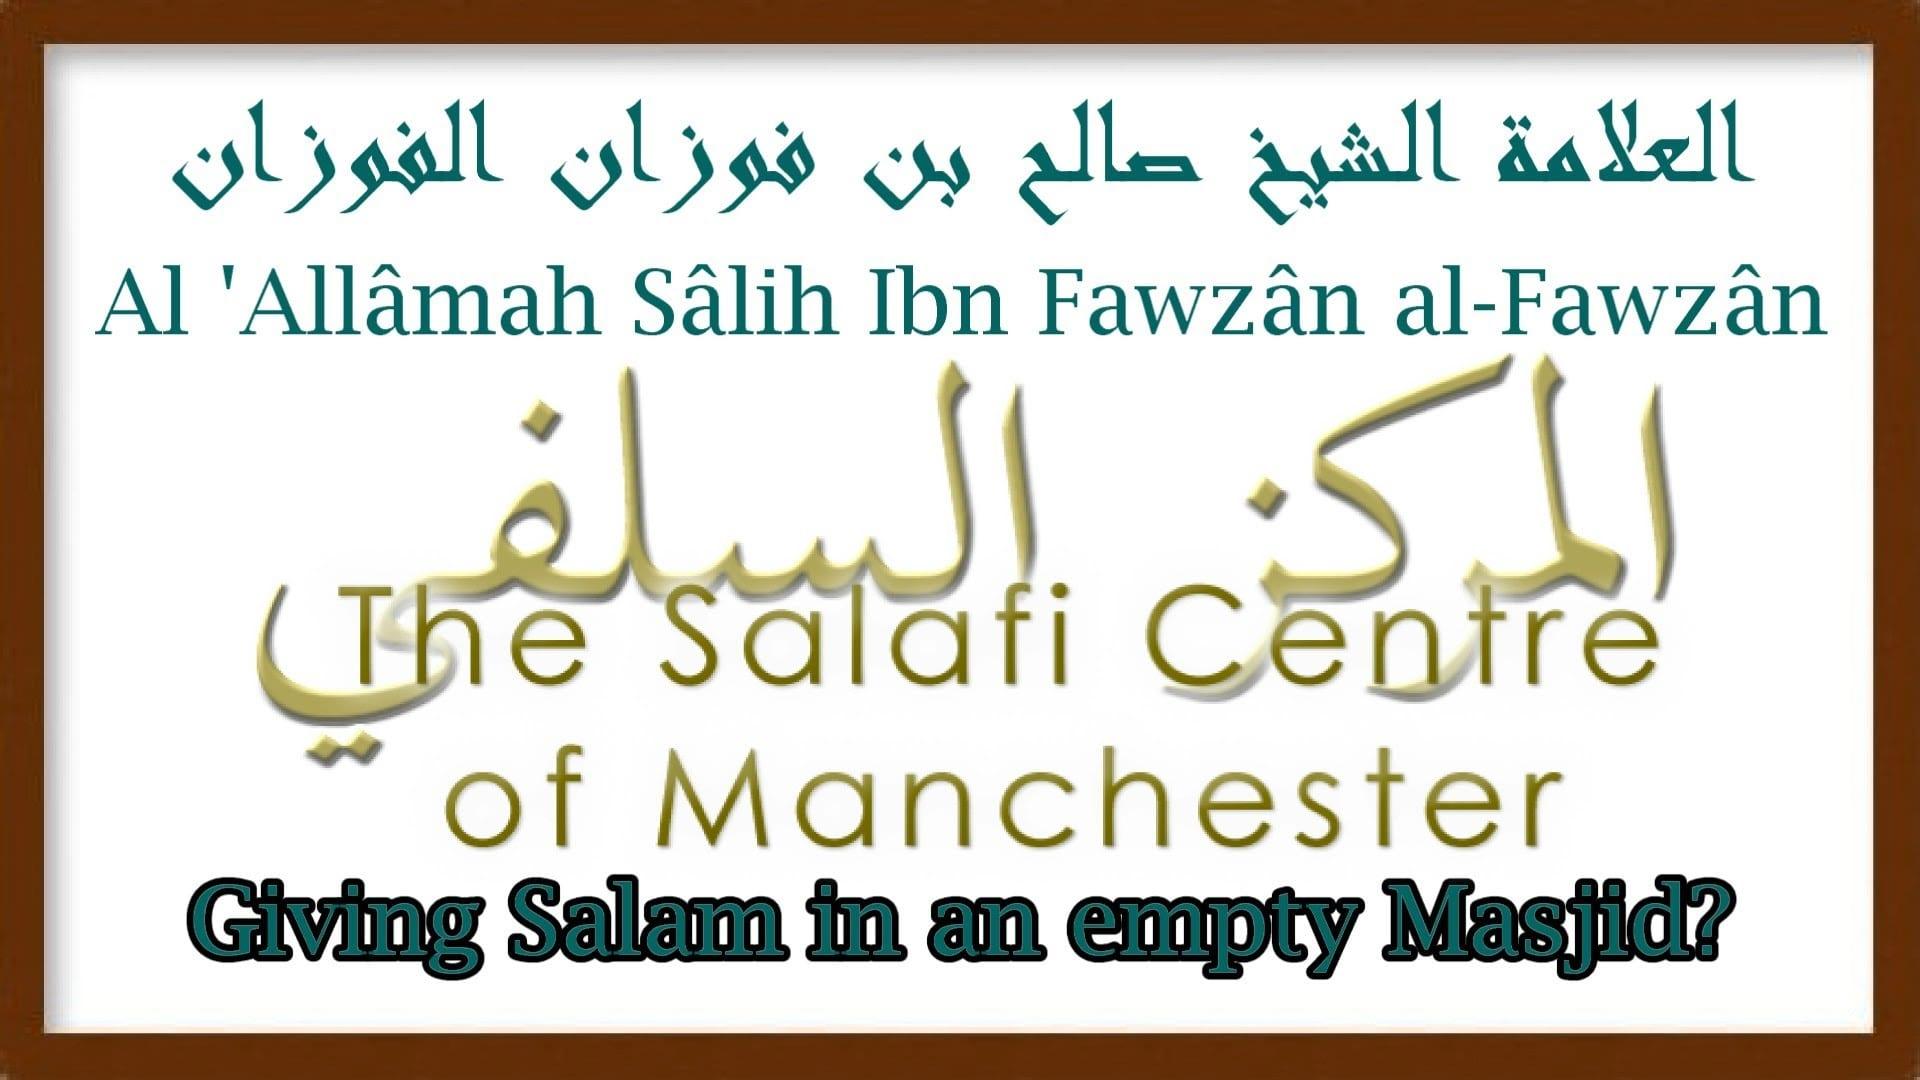 Giving Salam in an Emtpy Masjid?   Al-'Allâmah Sâlih al-Fawzân